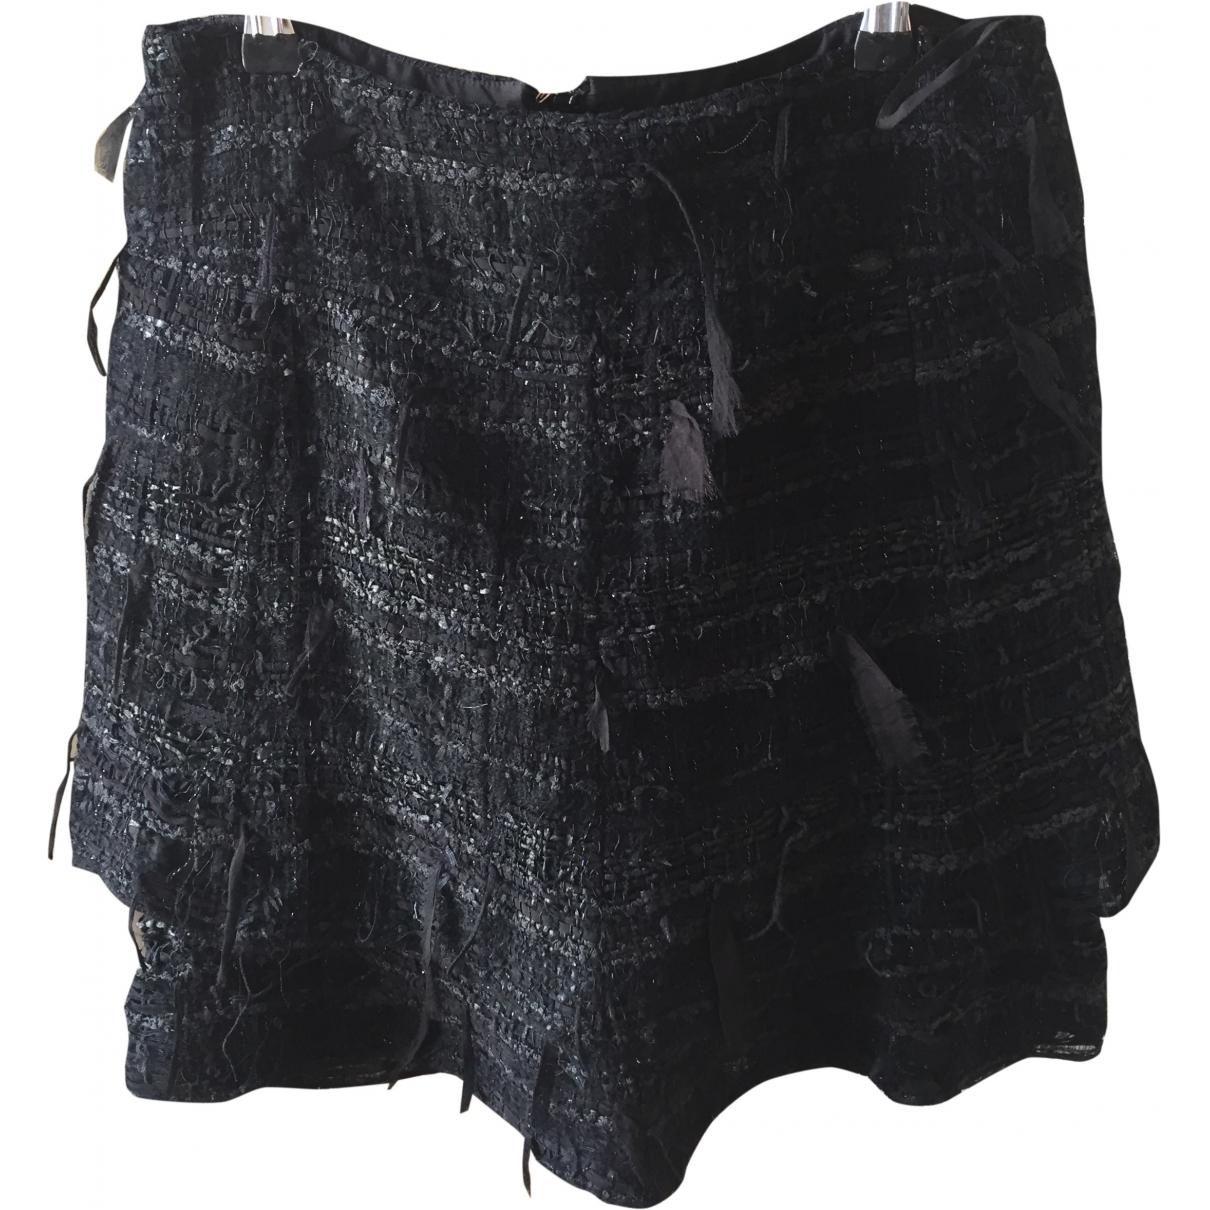 Chanel \N Black Tweed skirt for Women 38 FR